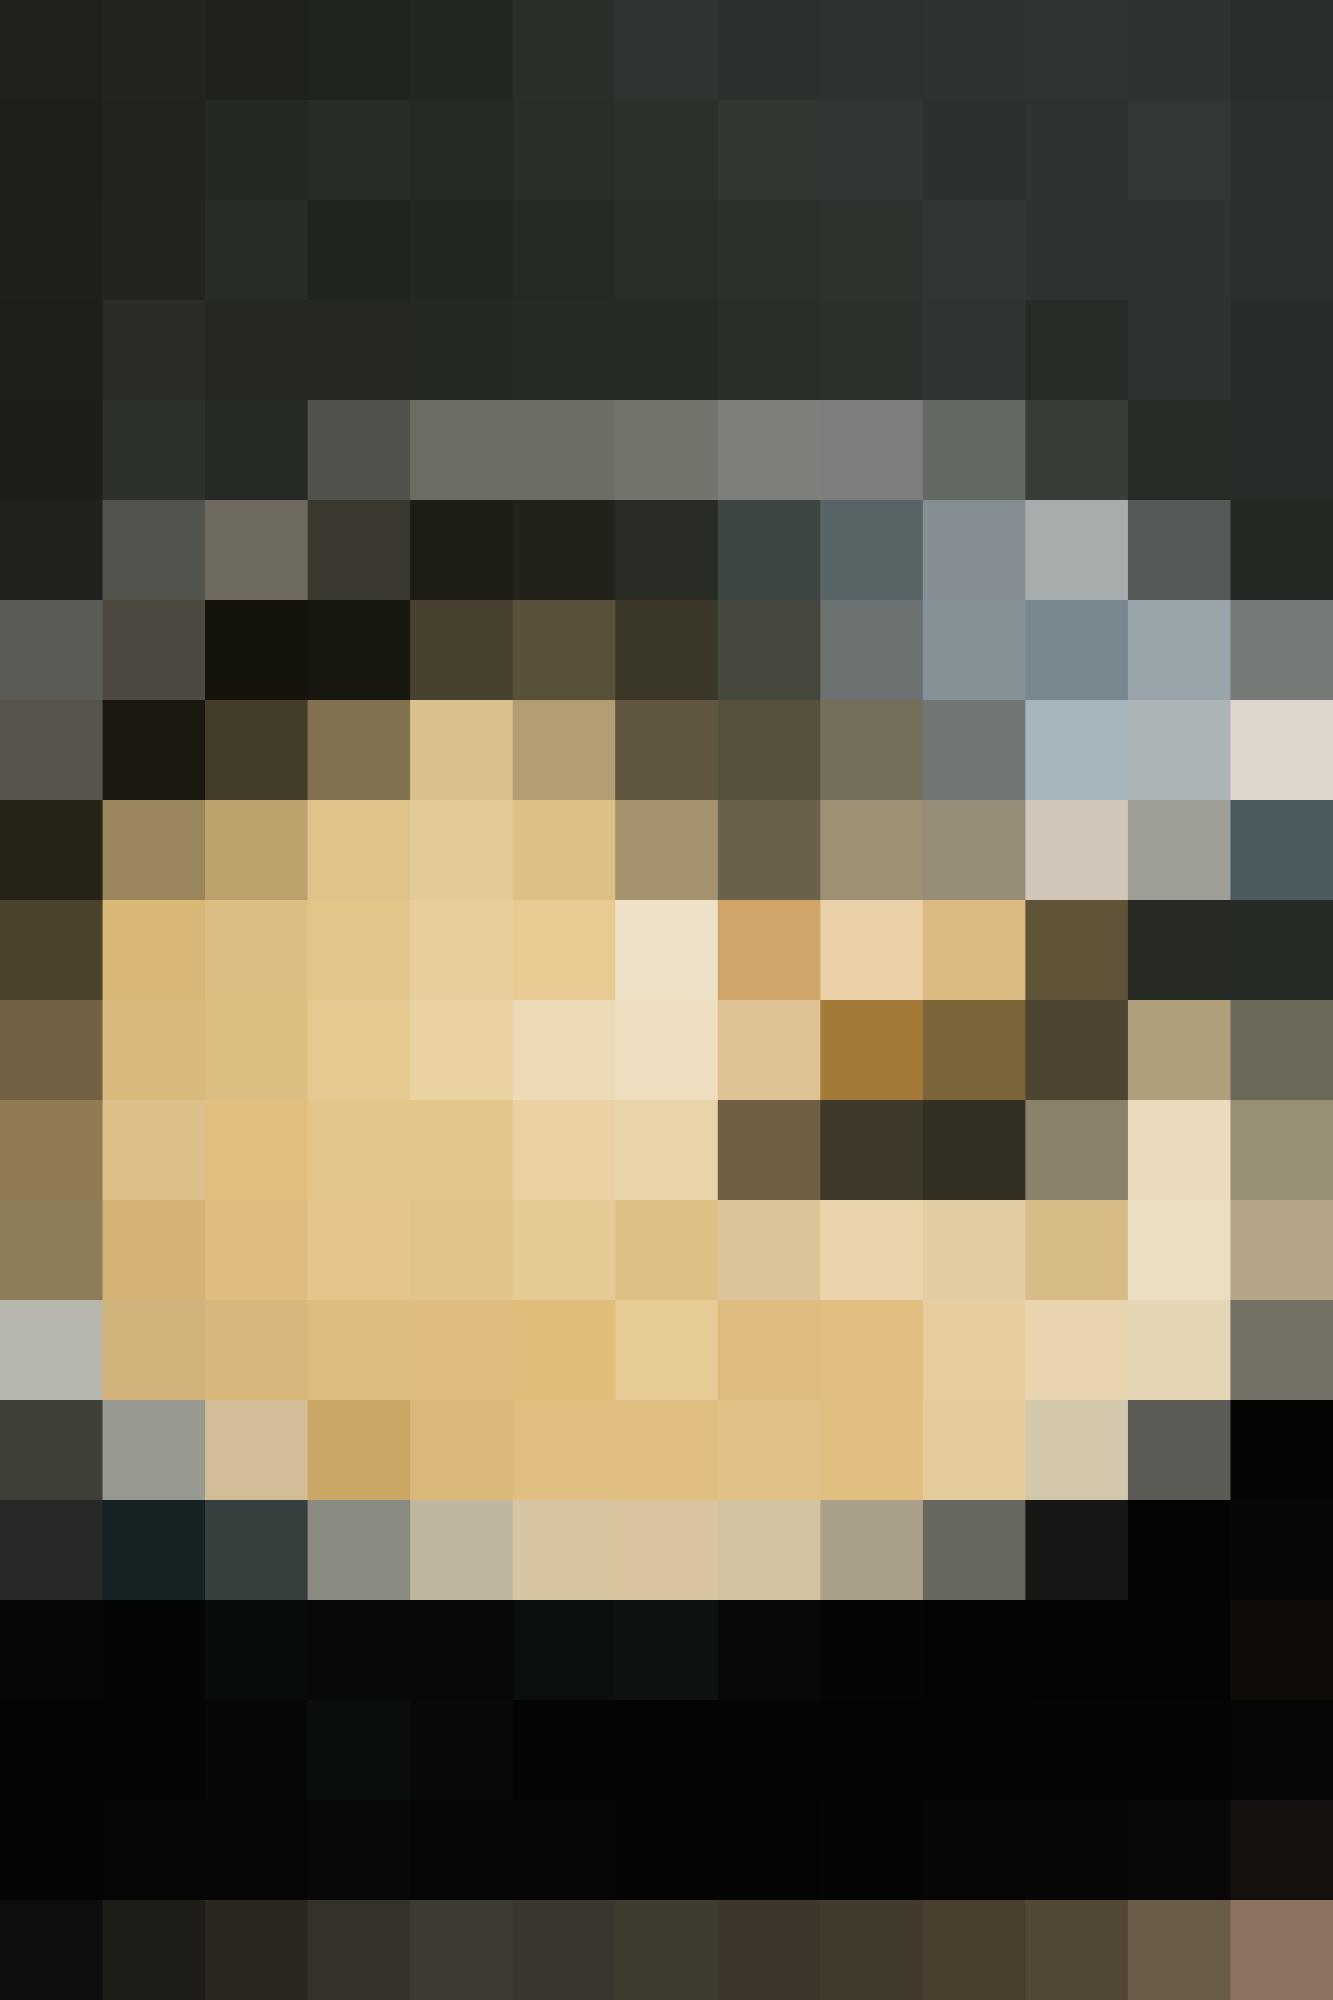 How To Scramble Tofu: gallery image 2